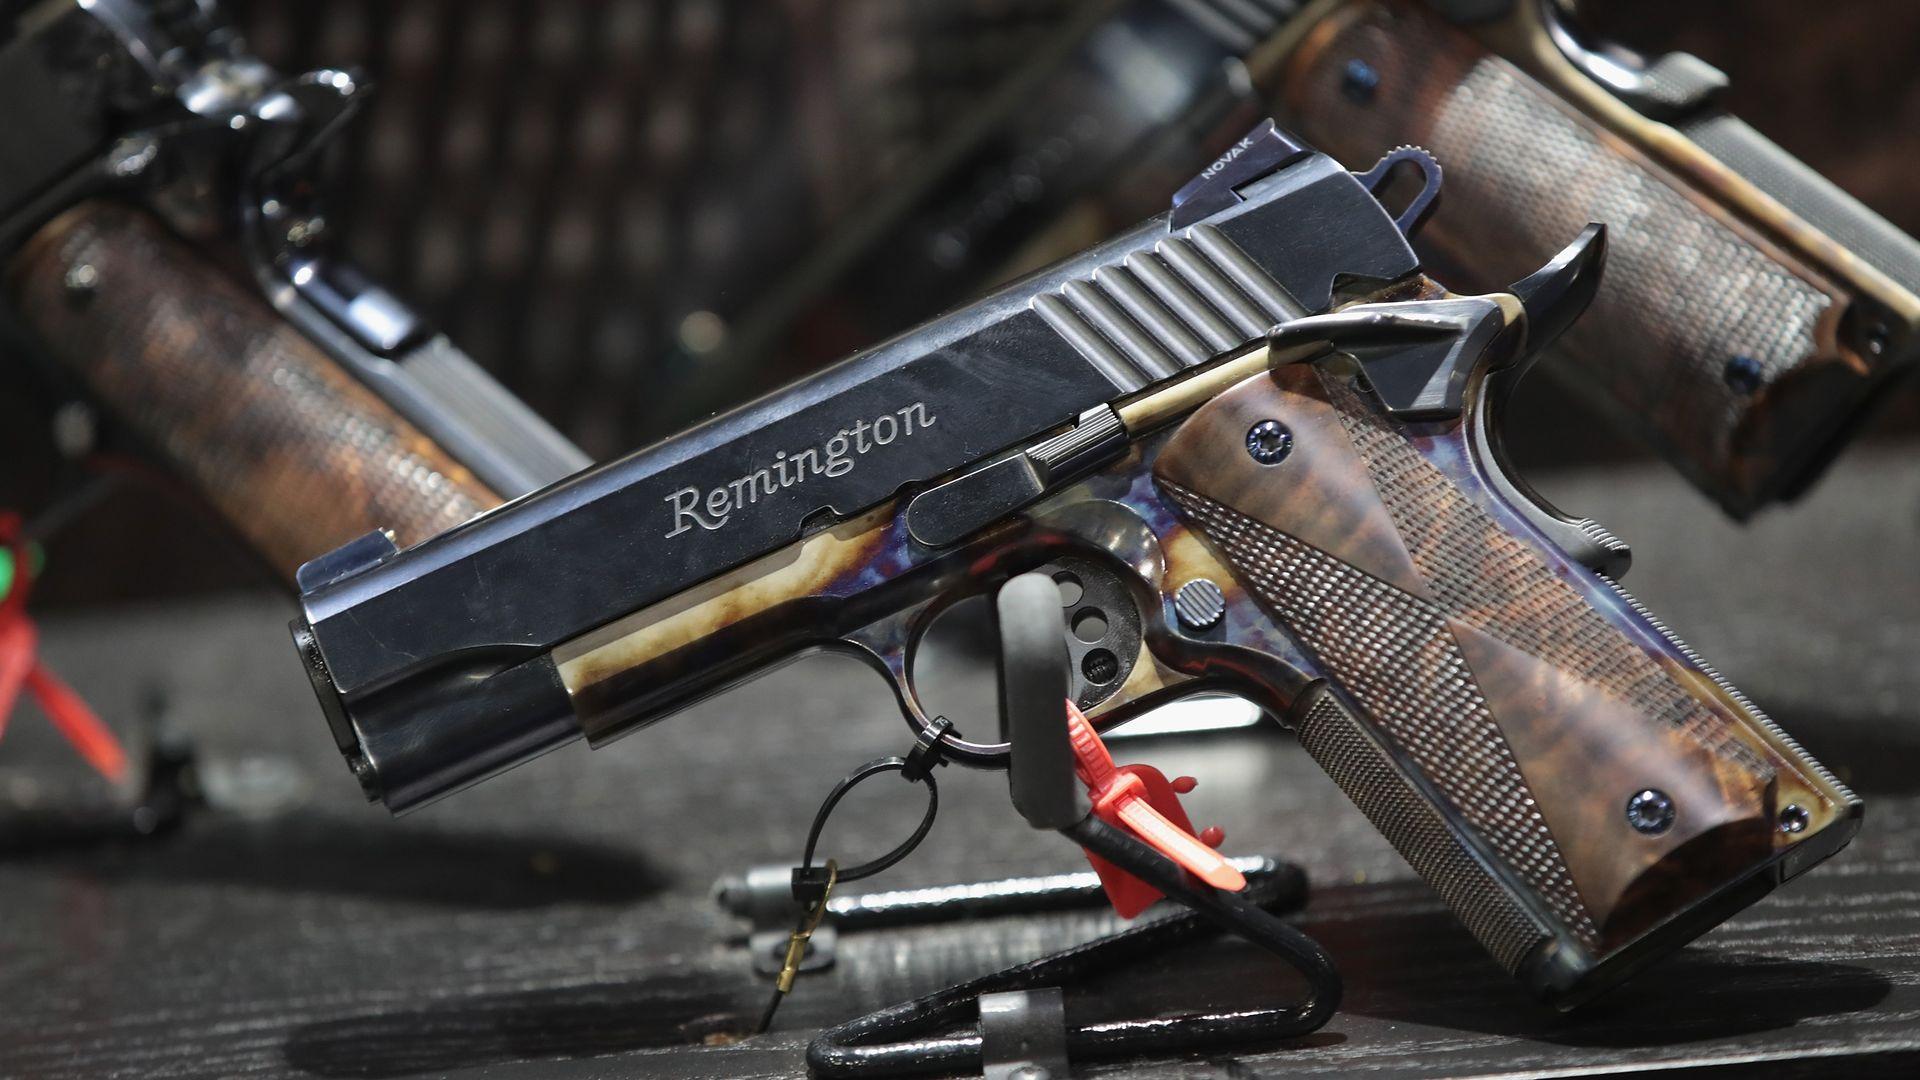 Custom Remington gun at NRA convention.